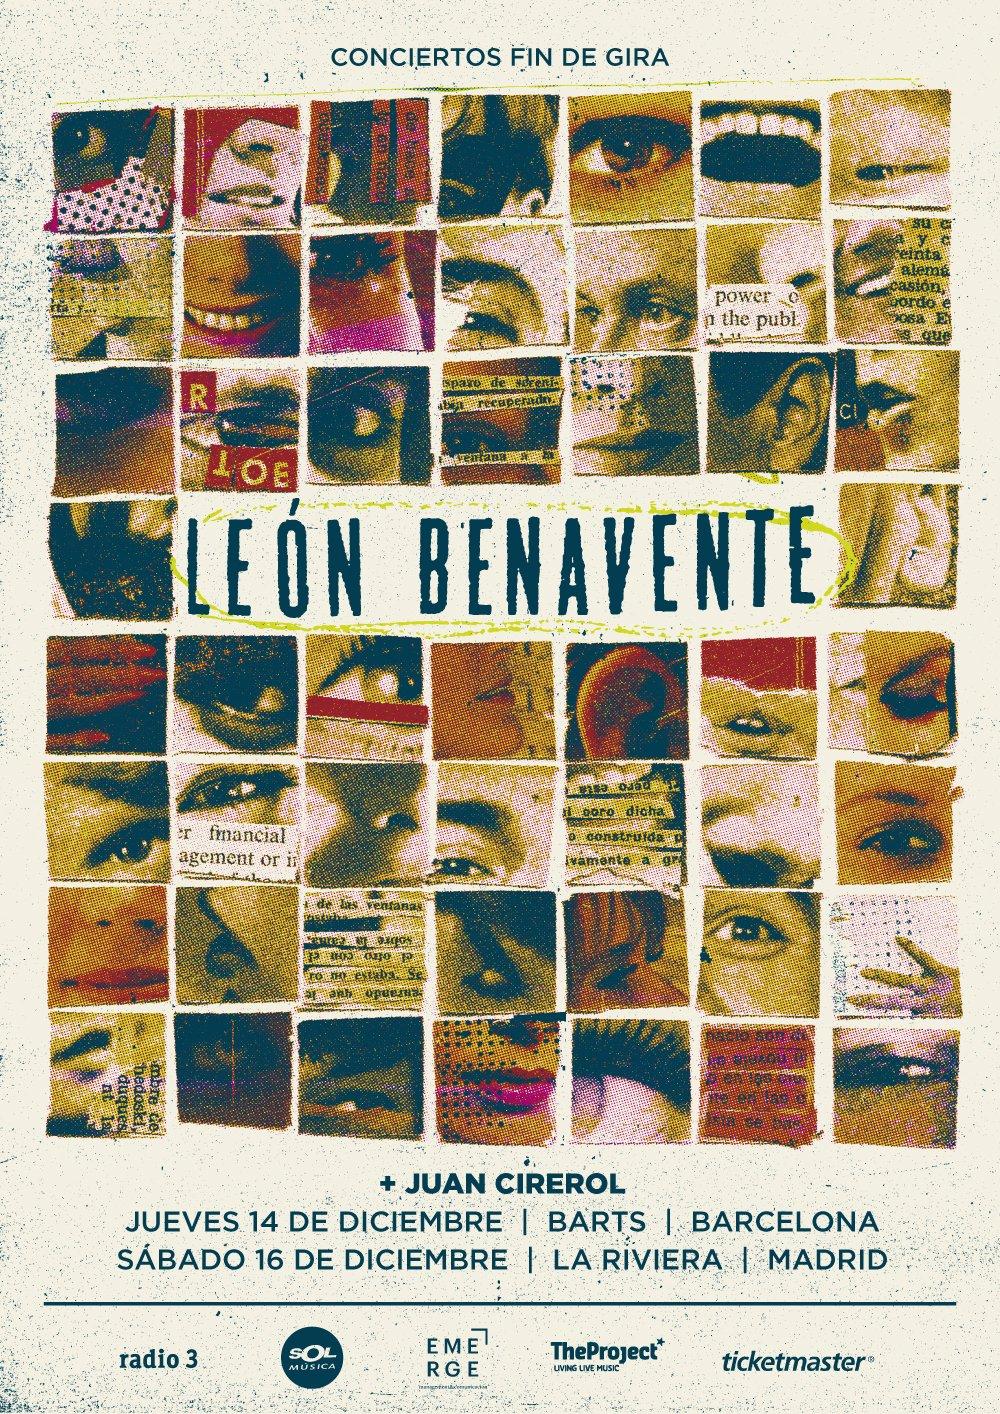 León Benavente - Página 8 DEiYO1yW0AUhH9v